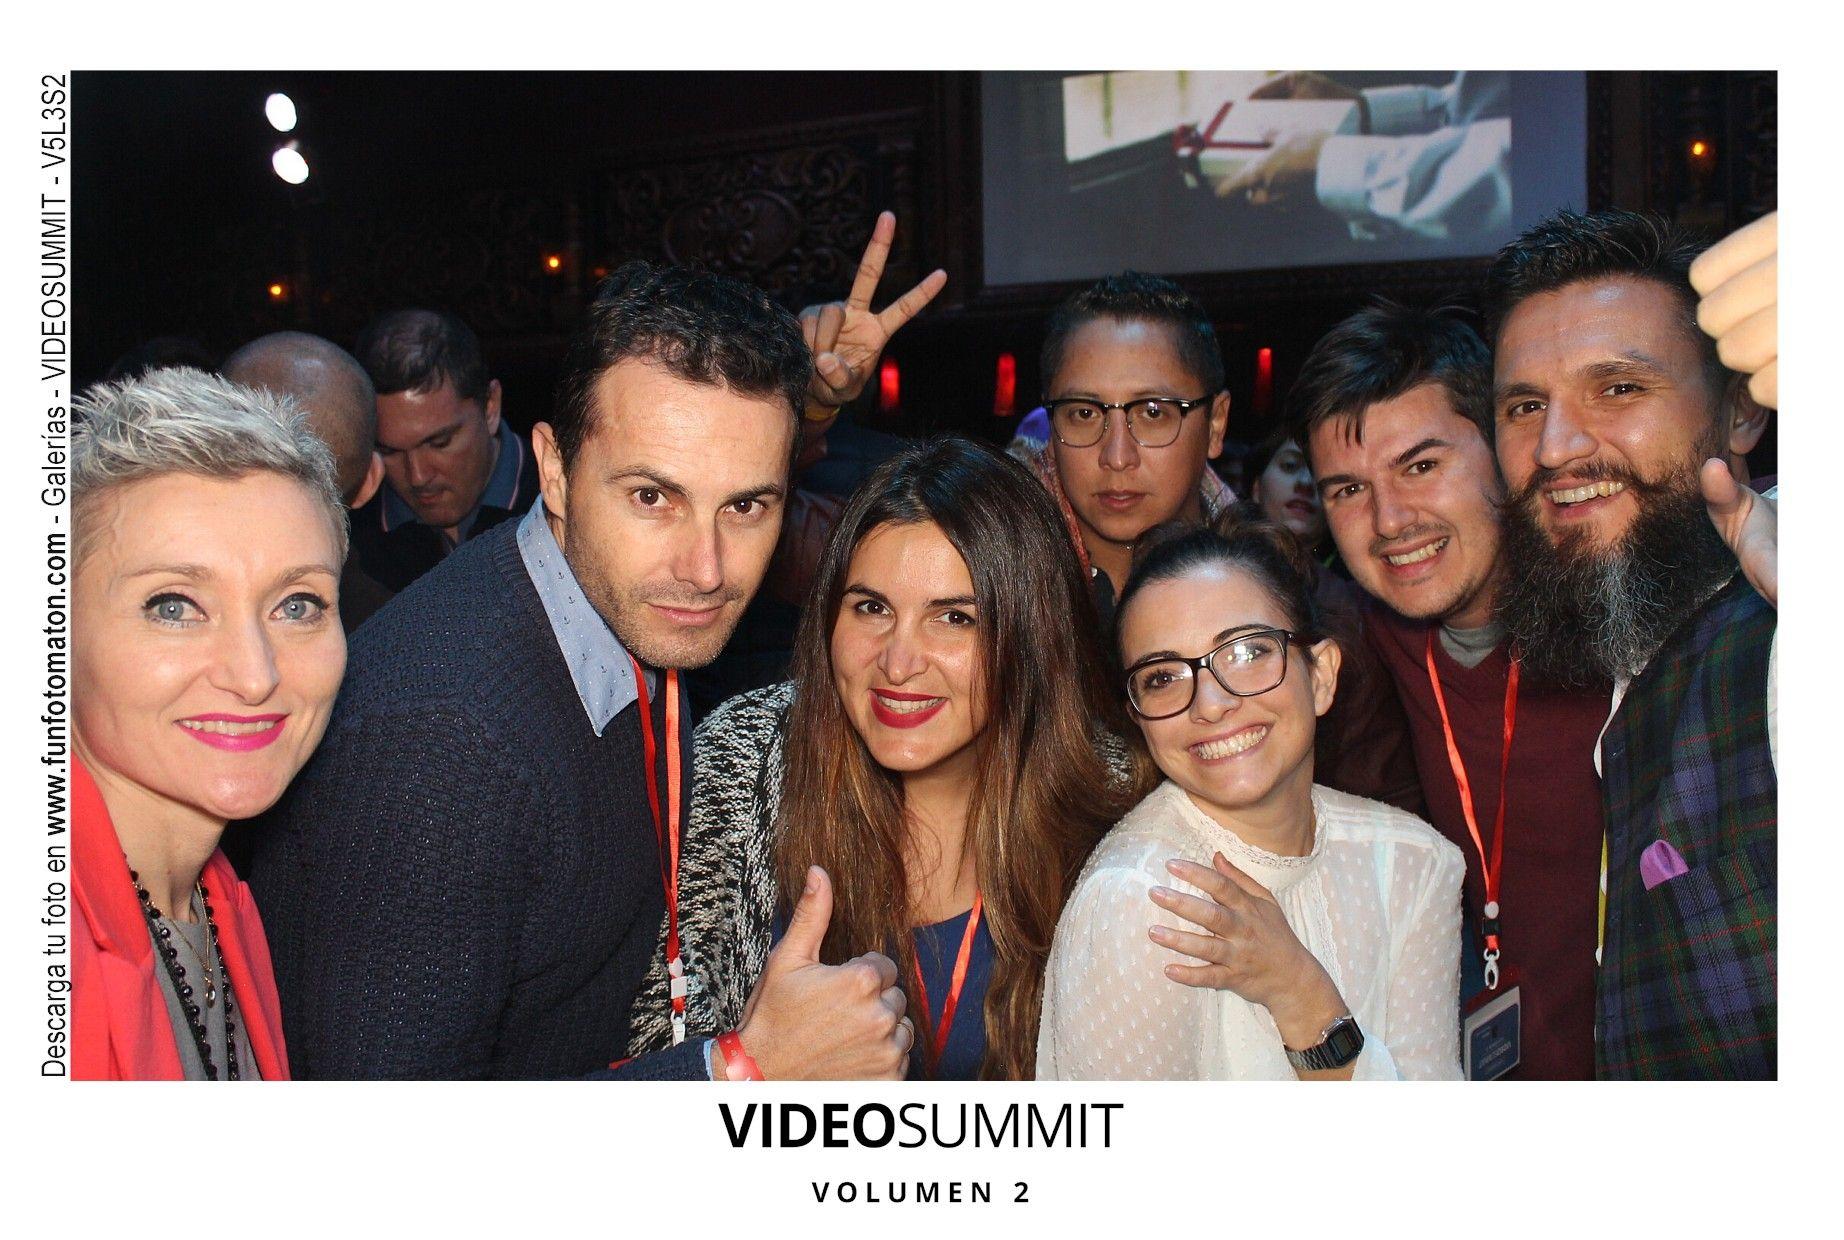 videosummit-vol2-club-party-044